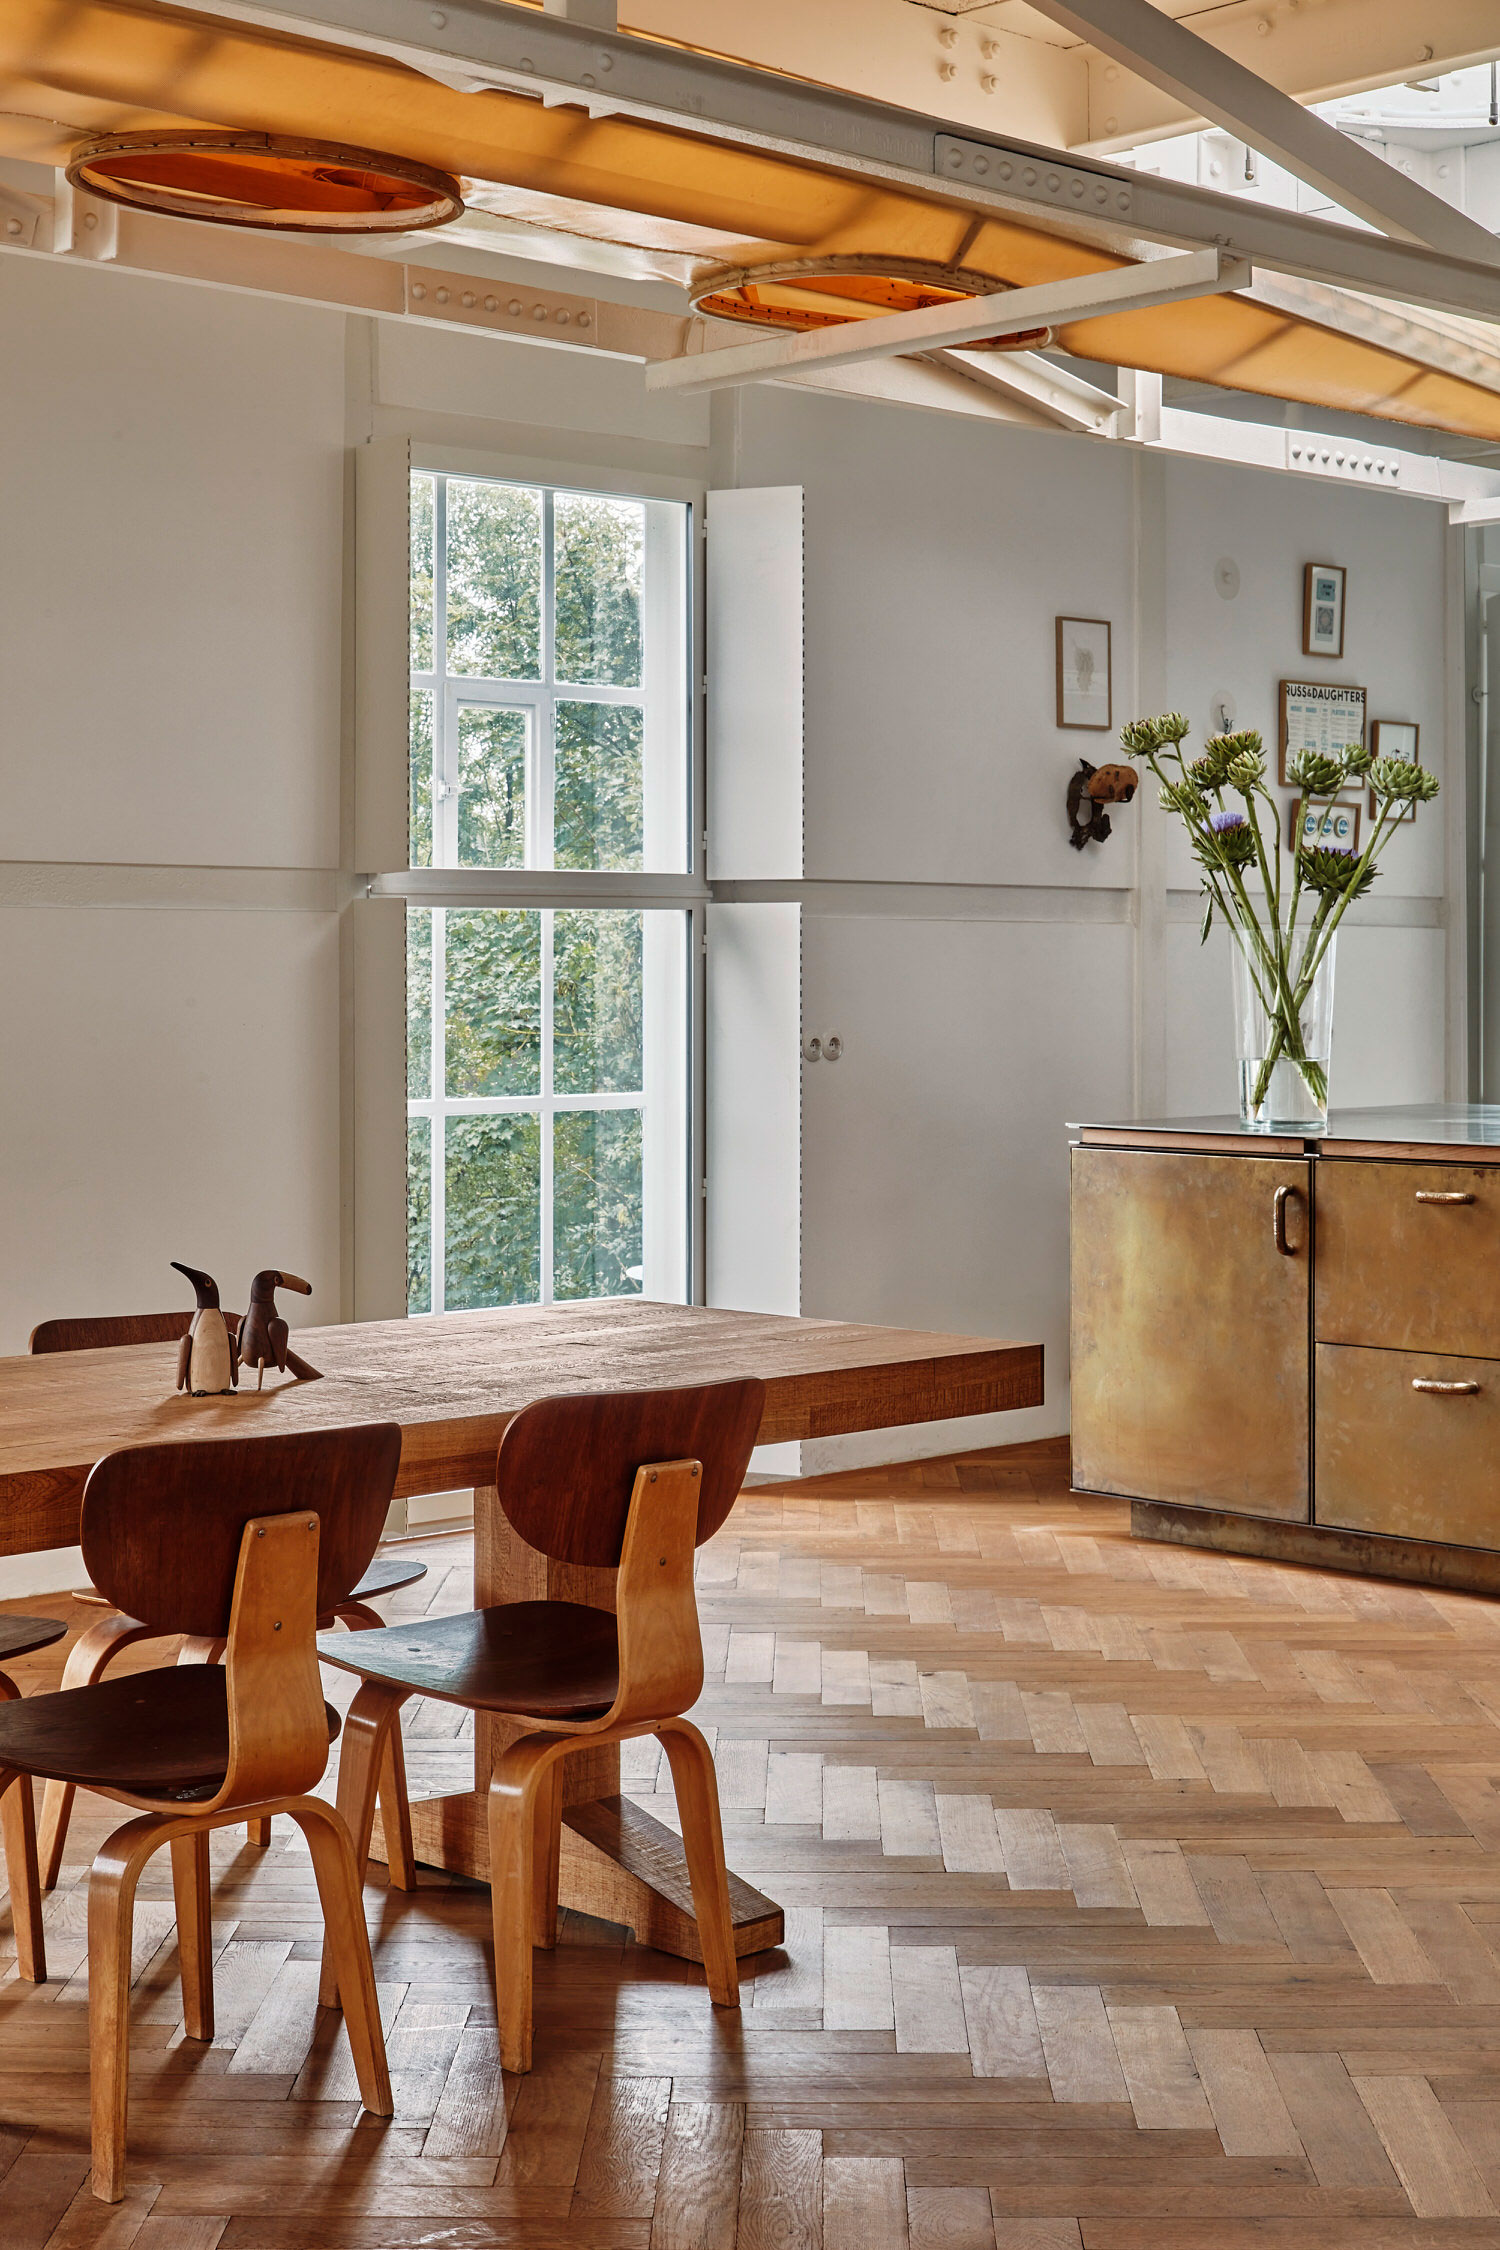 Studio Modijefsky, Ketelhuis Residence Zaandam, Residential Interior, Gallery Space, Artist Studio, Photo Maarten Willemstein | Yellowtrace